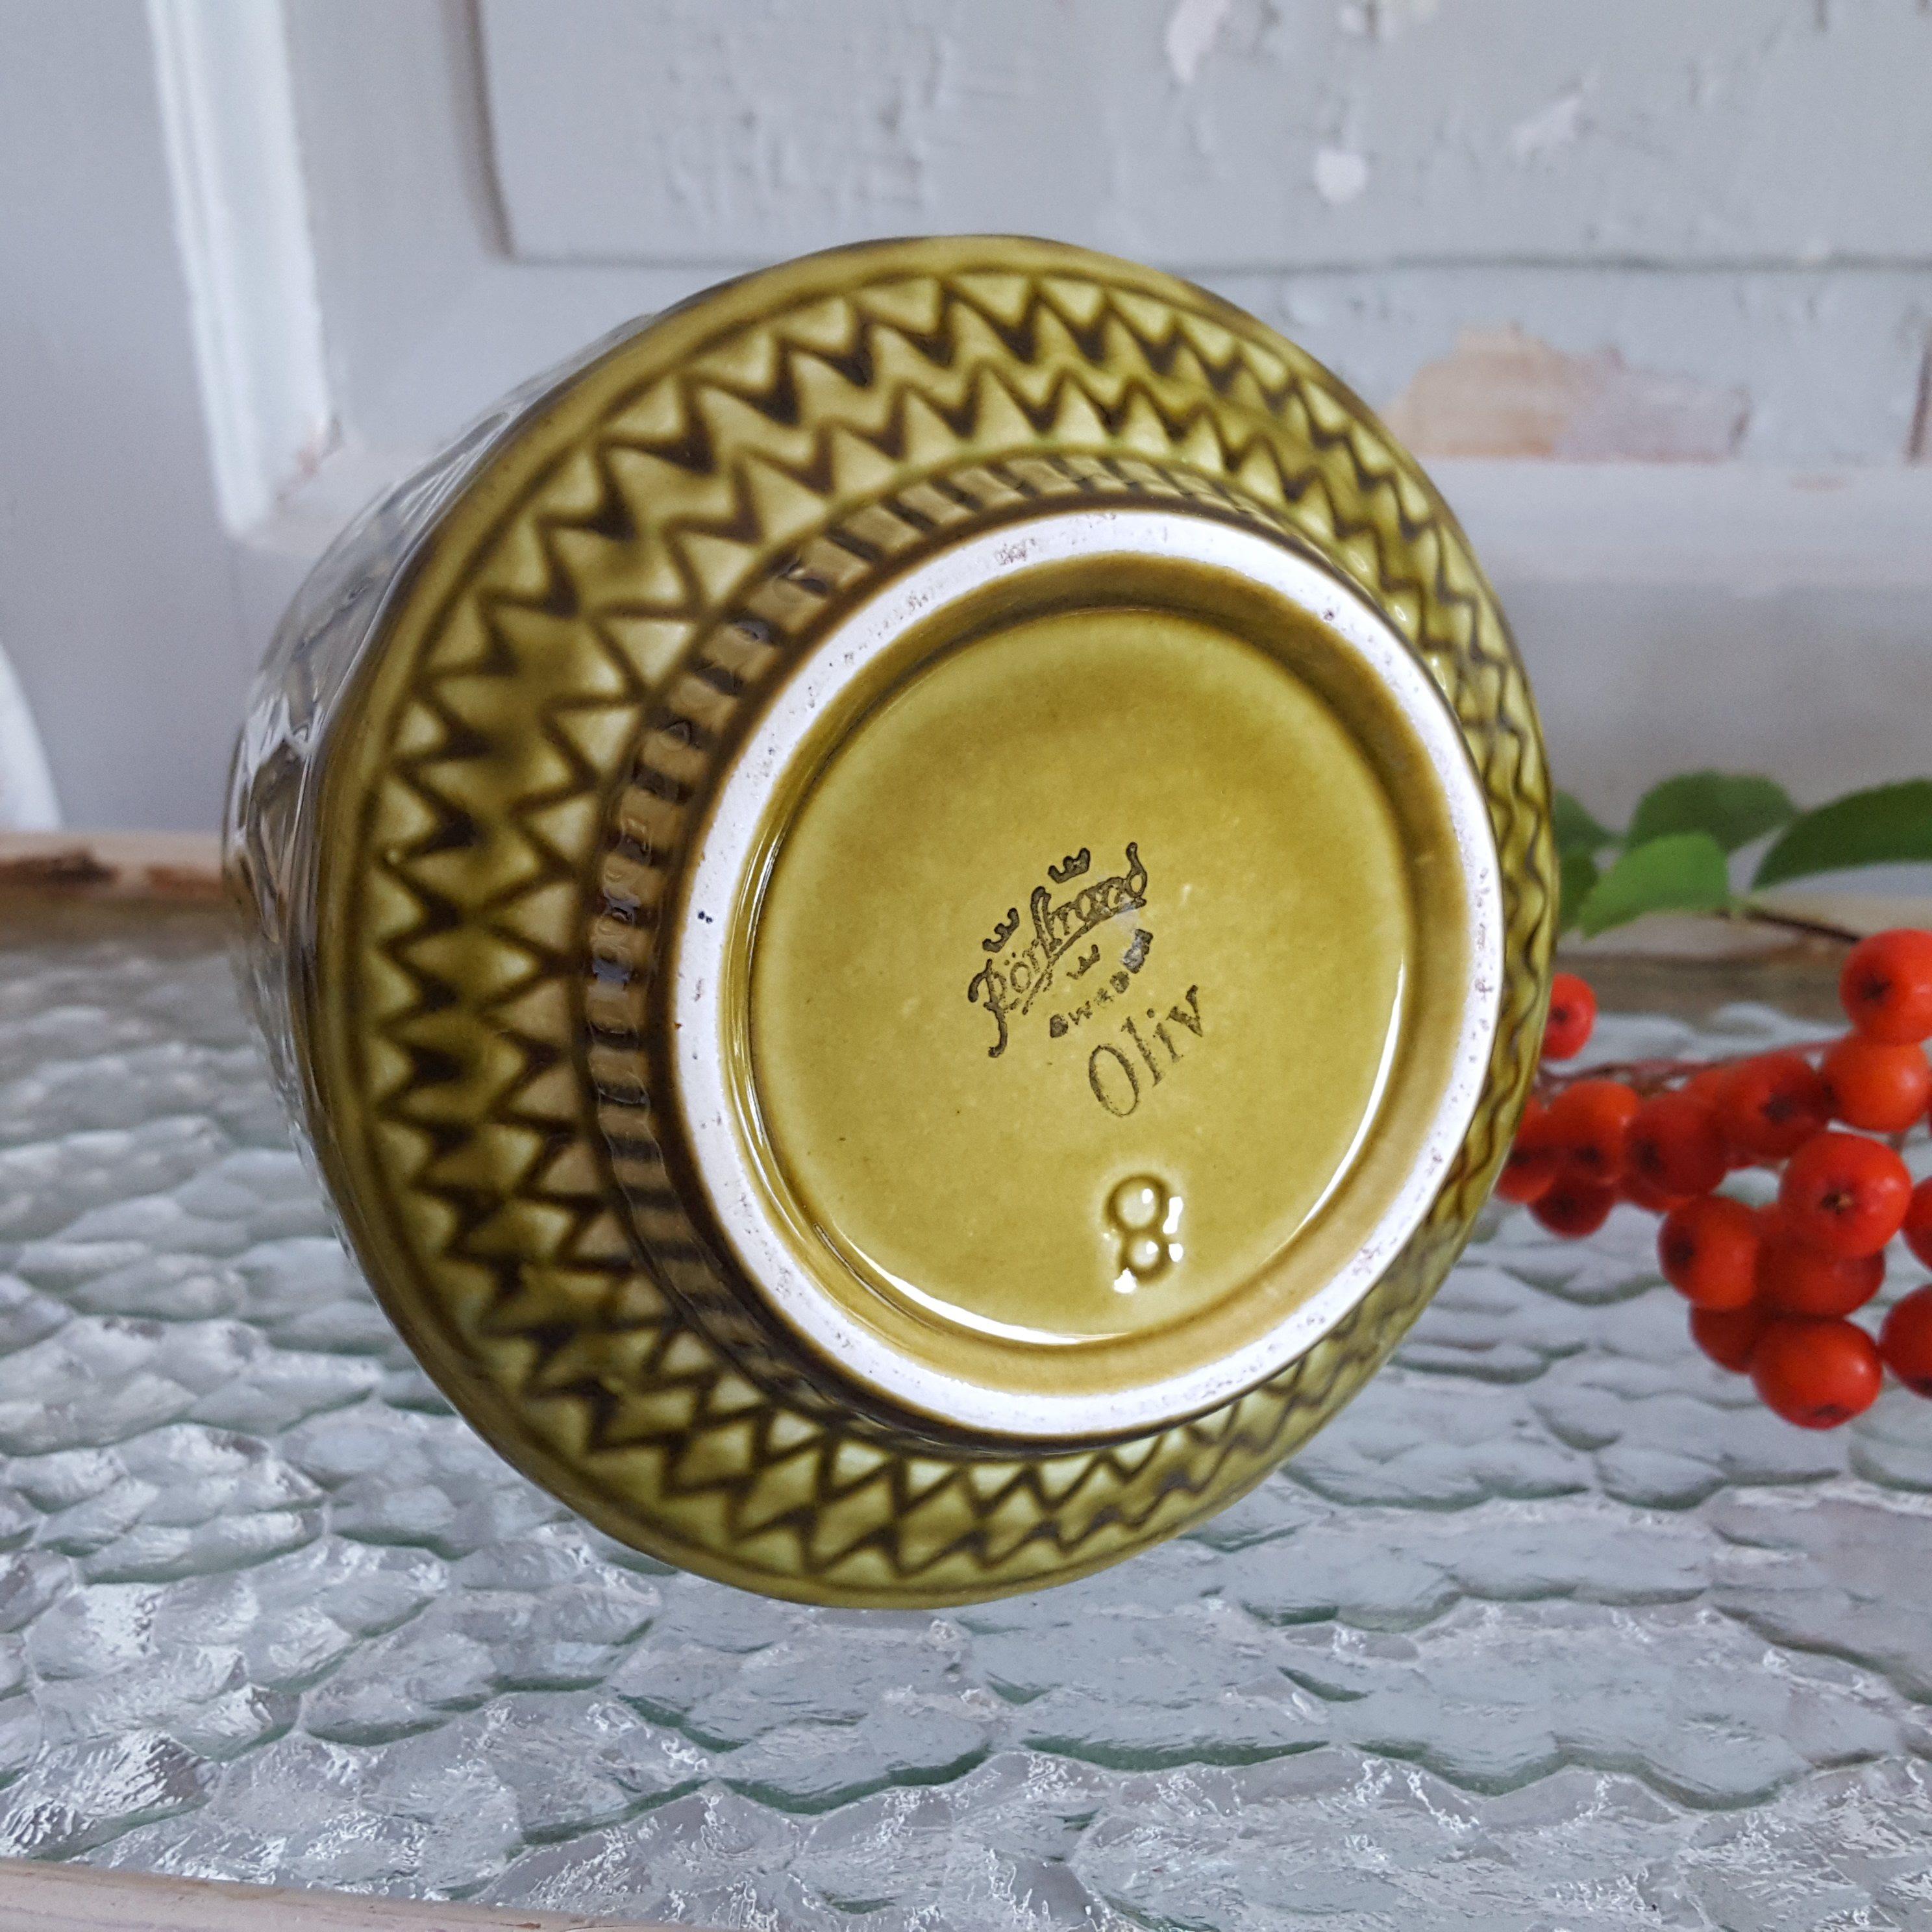 rørstrand keramik Vas   Oliv   Rörstrand   Keramik   Retrolivet rørstrand keramik